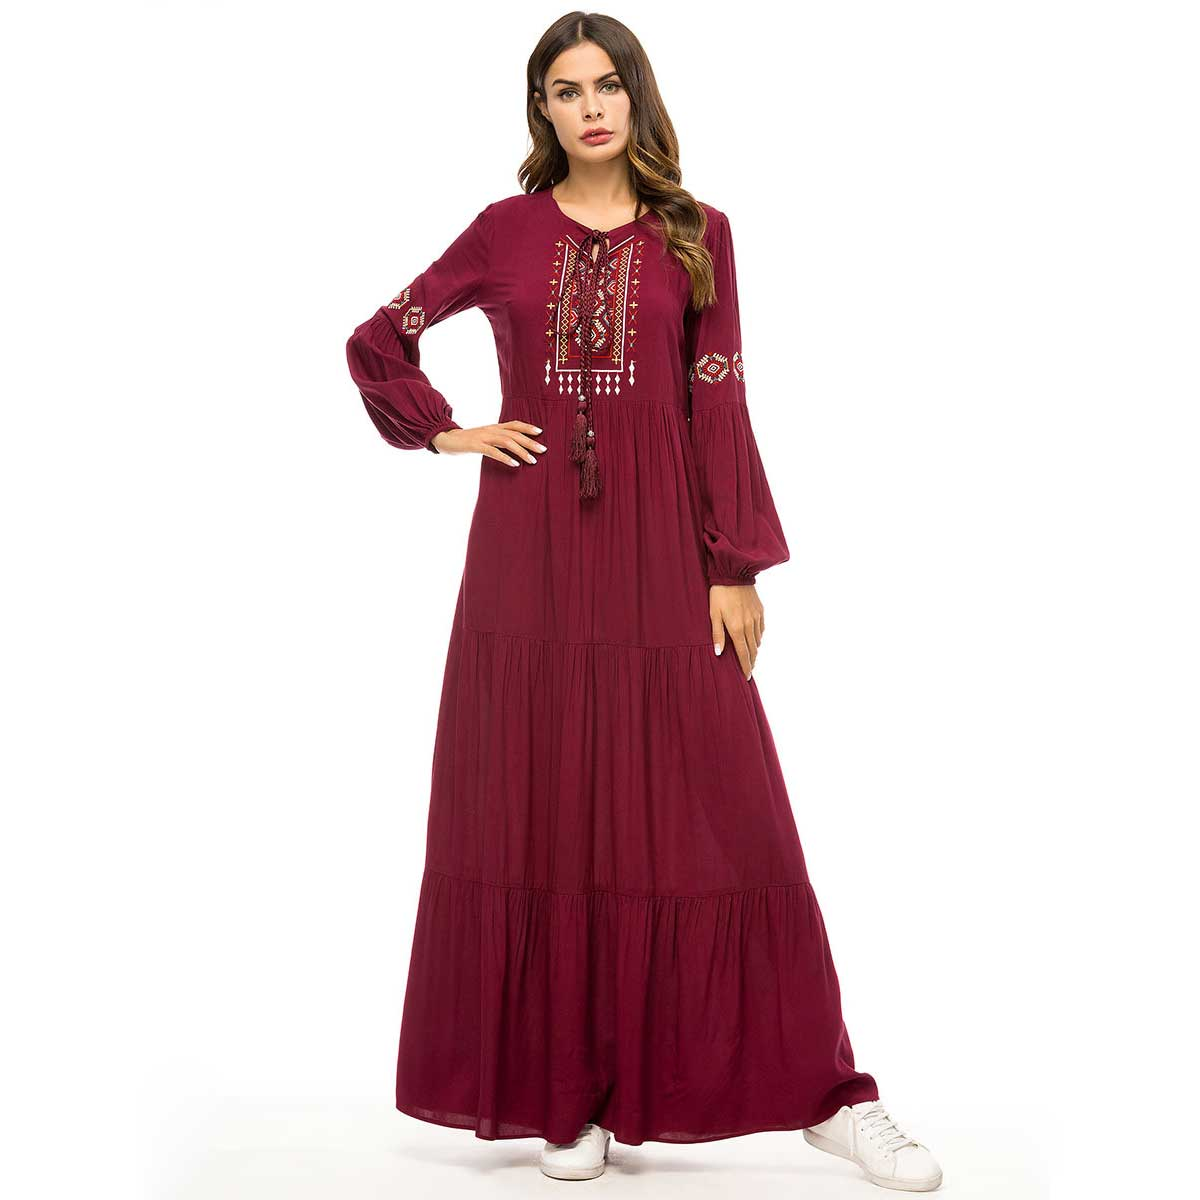 2019 Retro Ethnic Embroidery Maxi Dress Oversized Women Muslim Abaya Arabic Dubai Islamic UAE Pleated Robe Plus Size VKDR1447